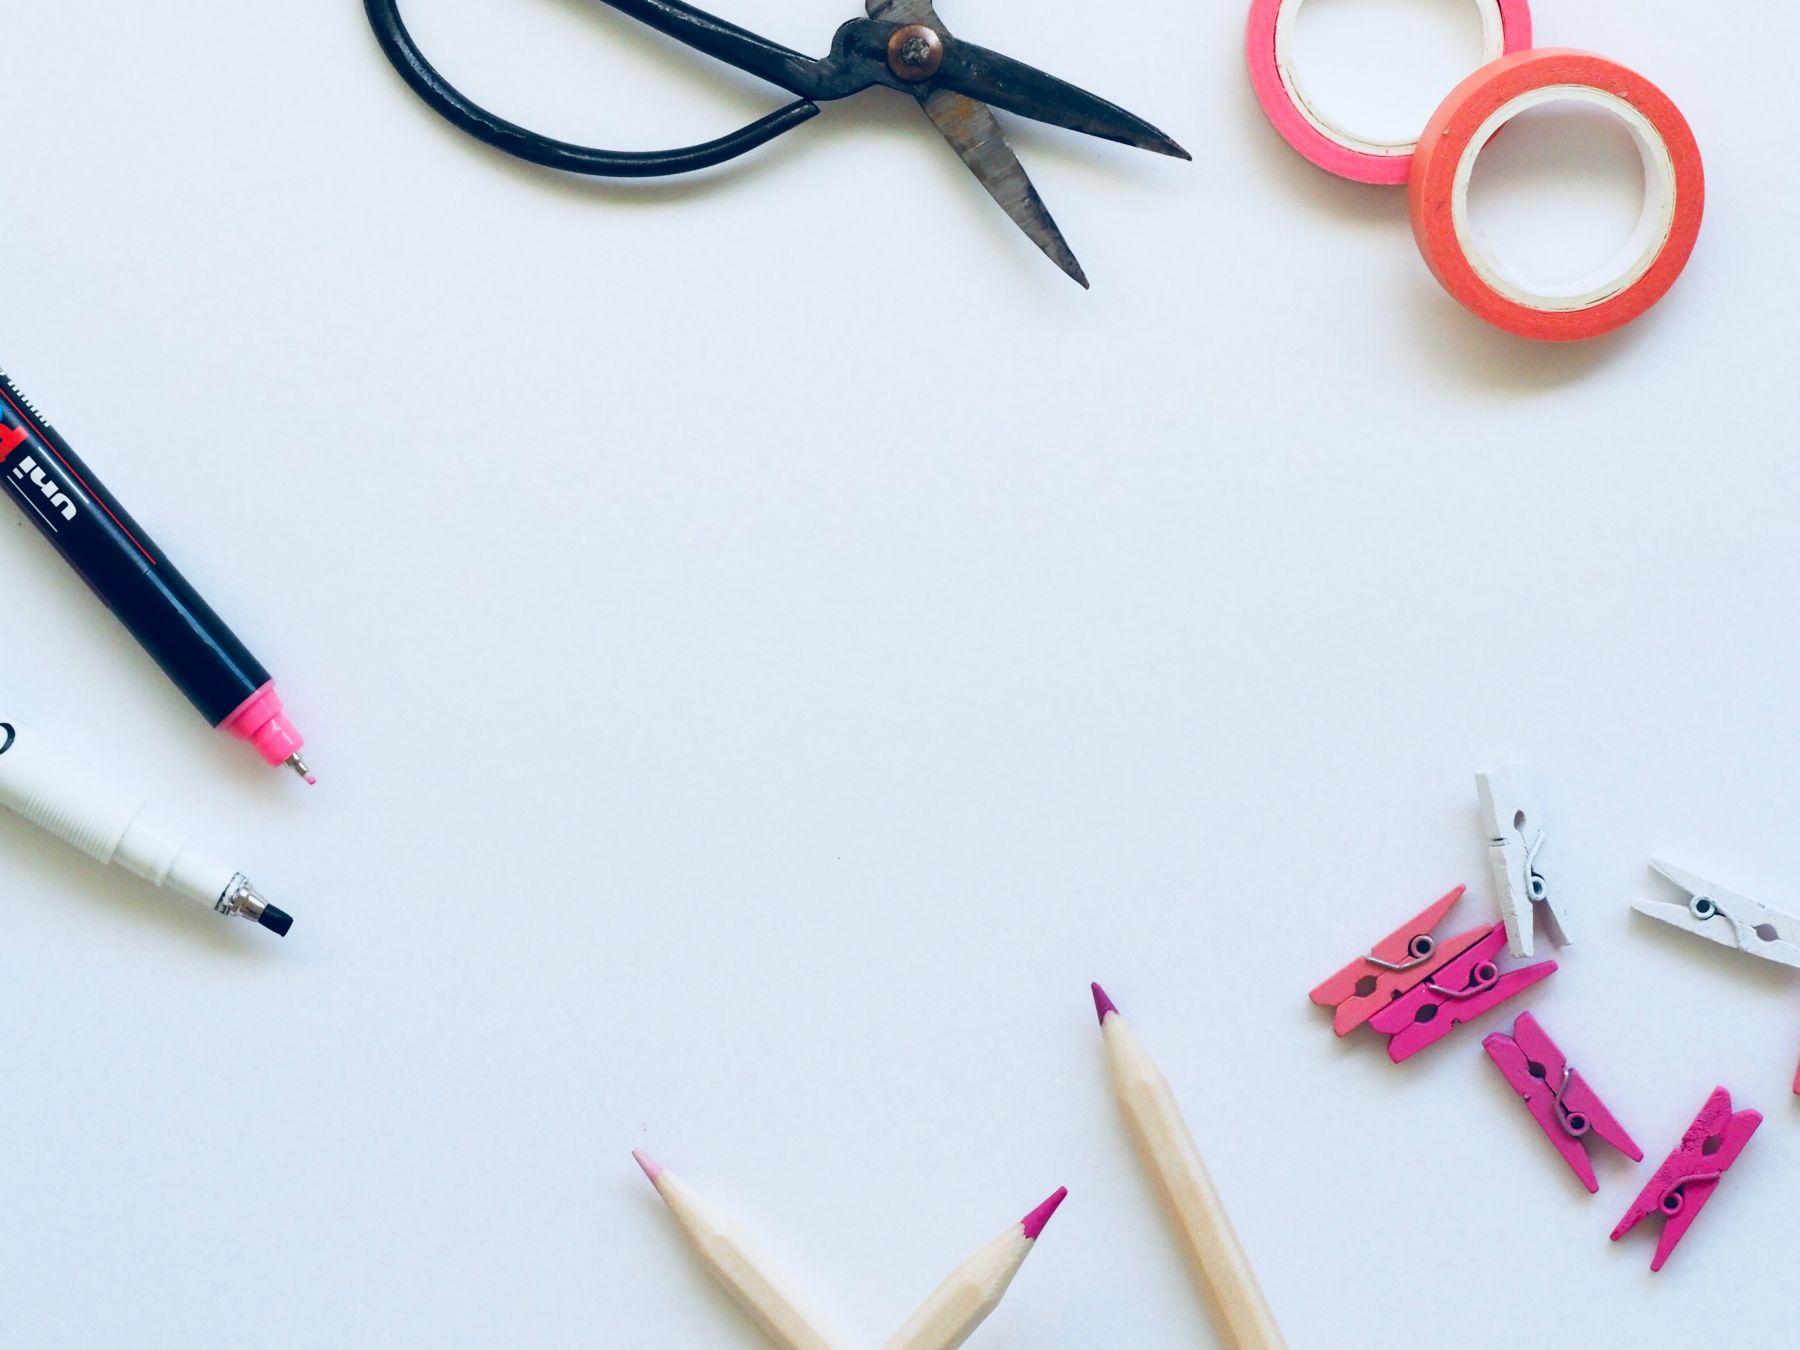 Image of craft materials